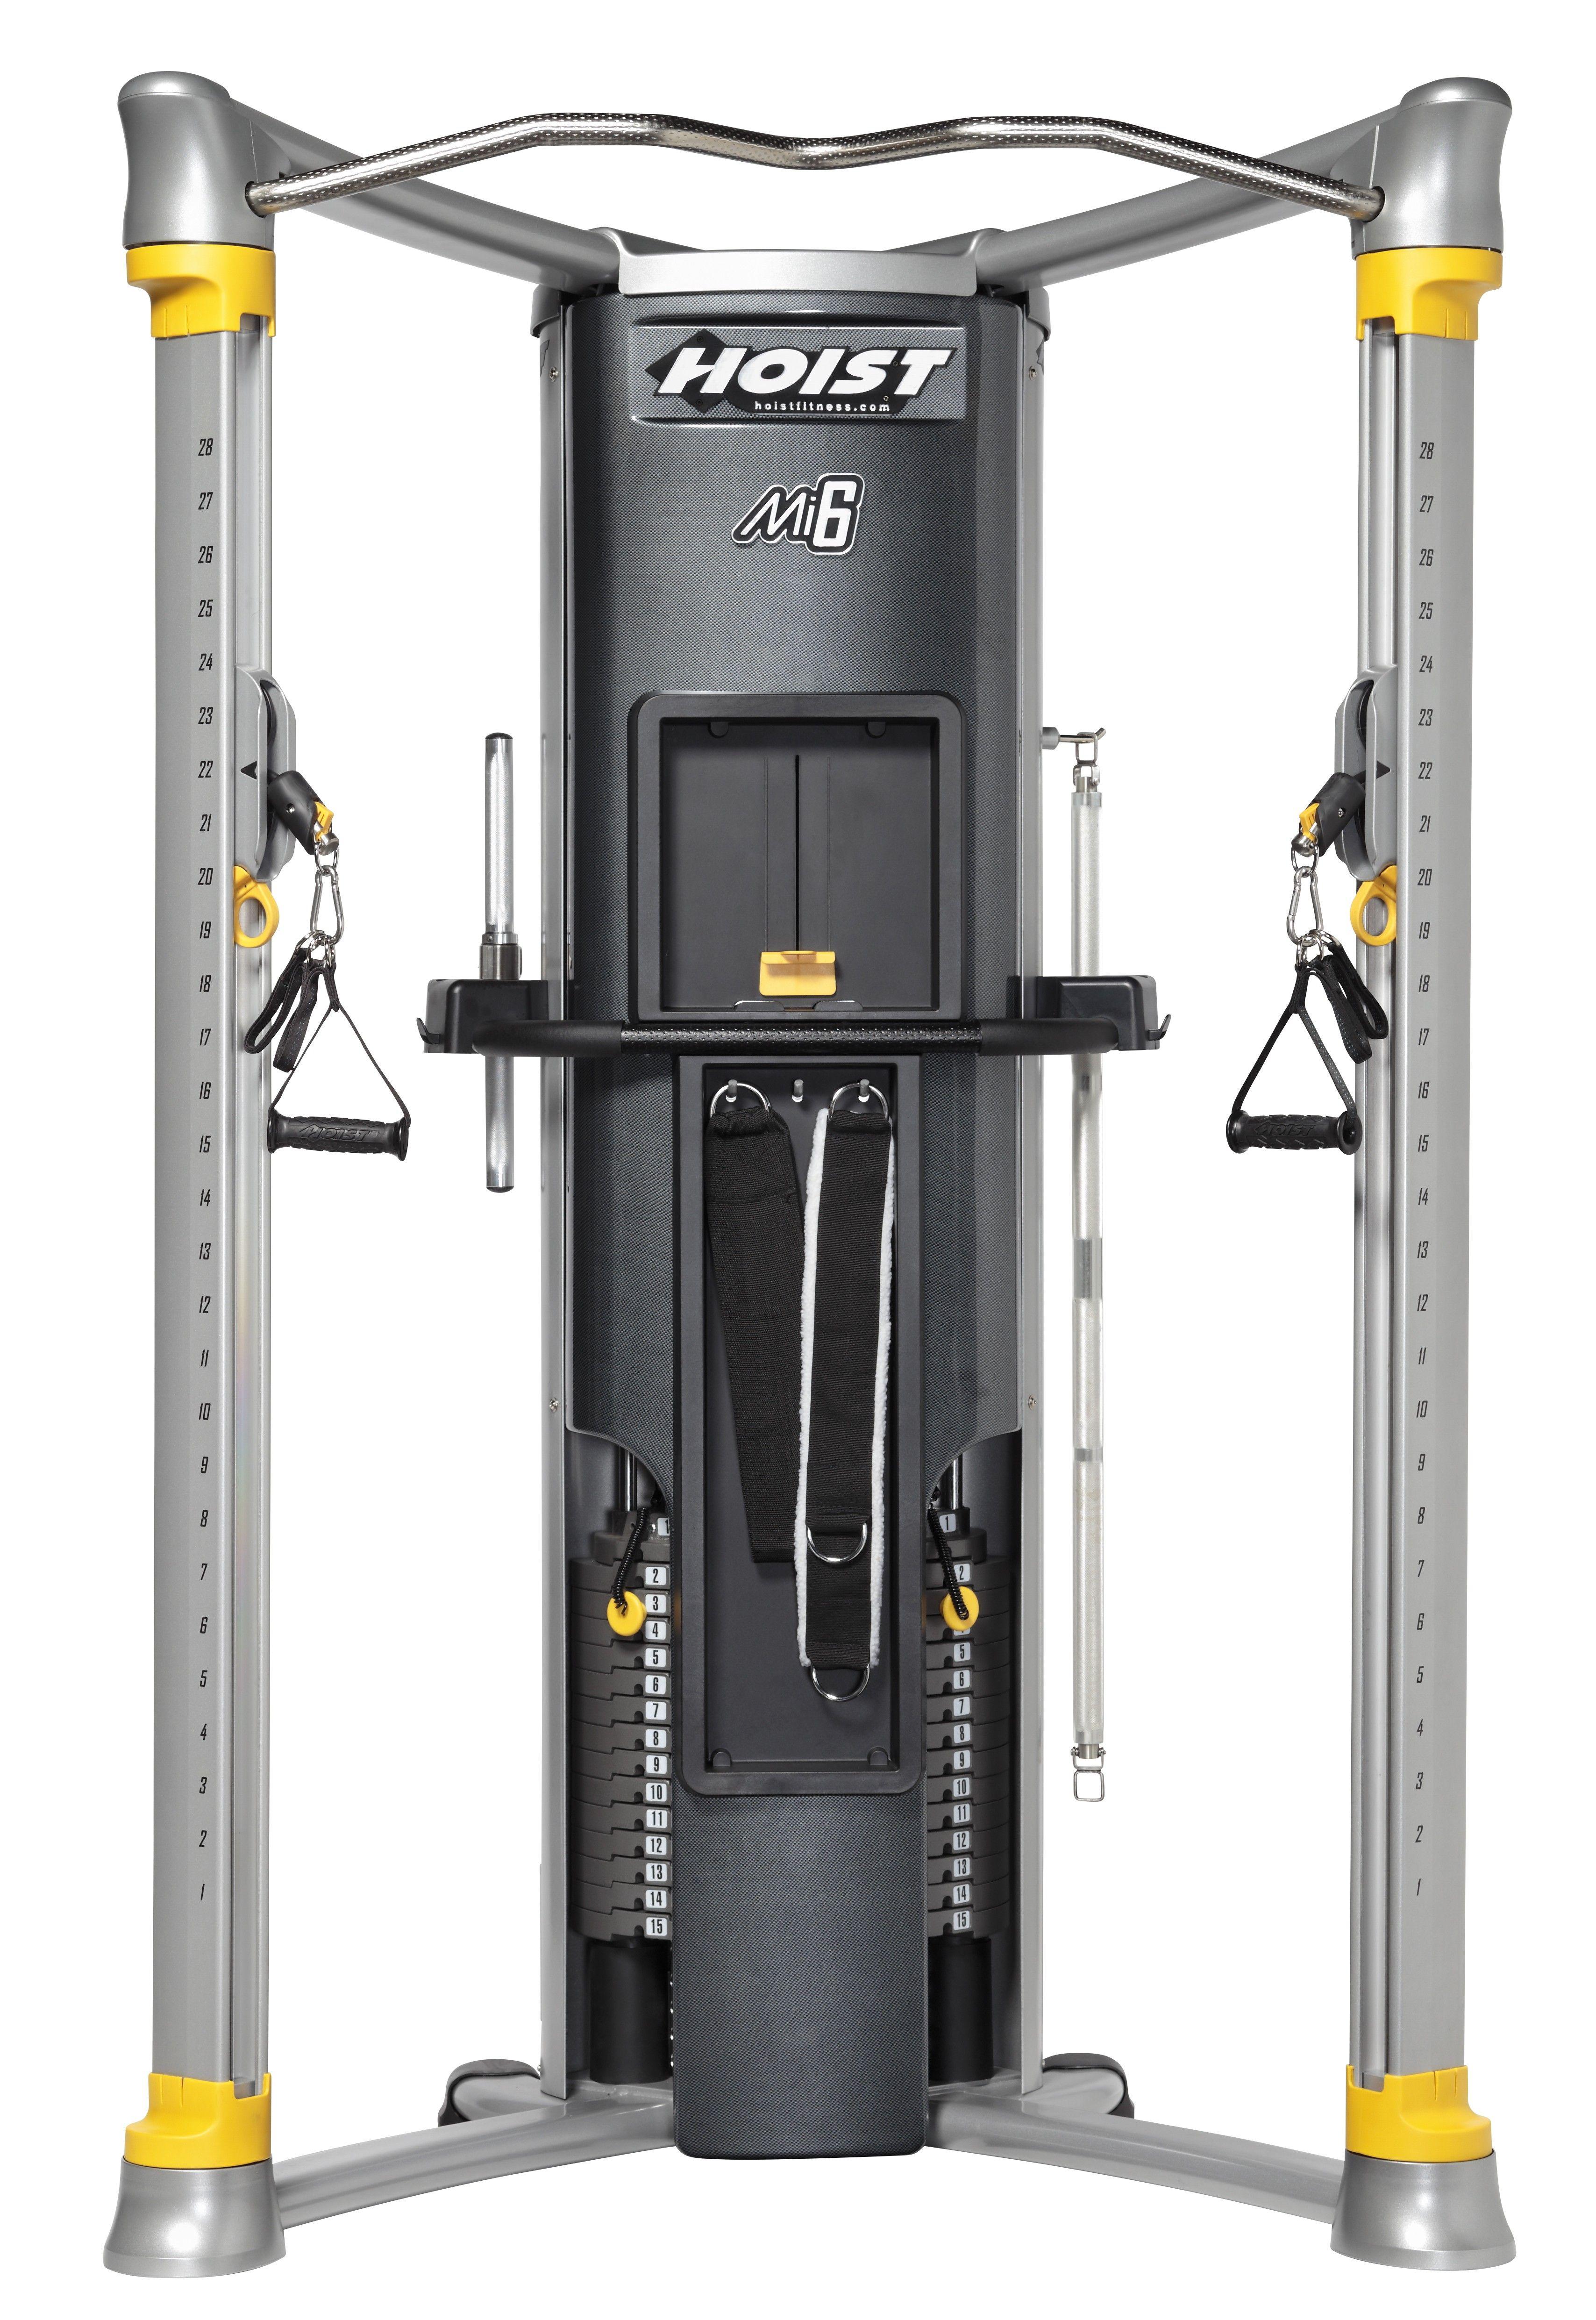 image organization garage bike system storage horizontal systems canada hoist car lift single diy